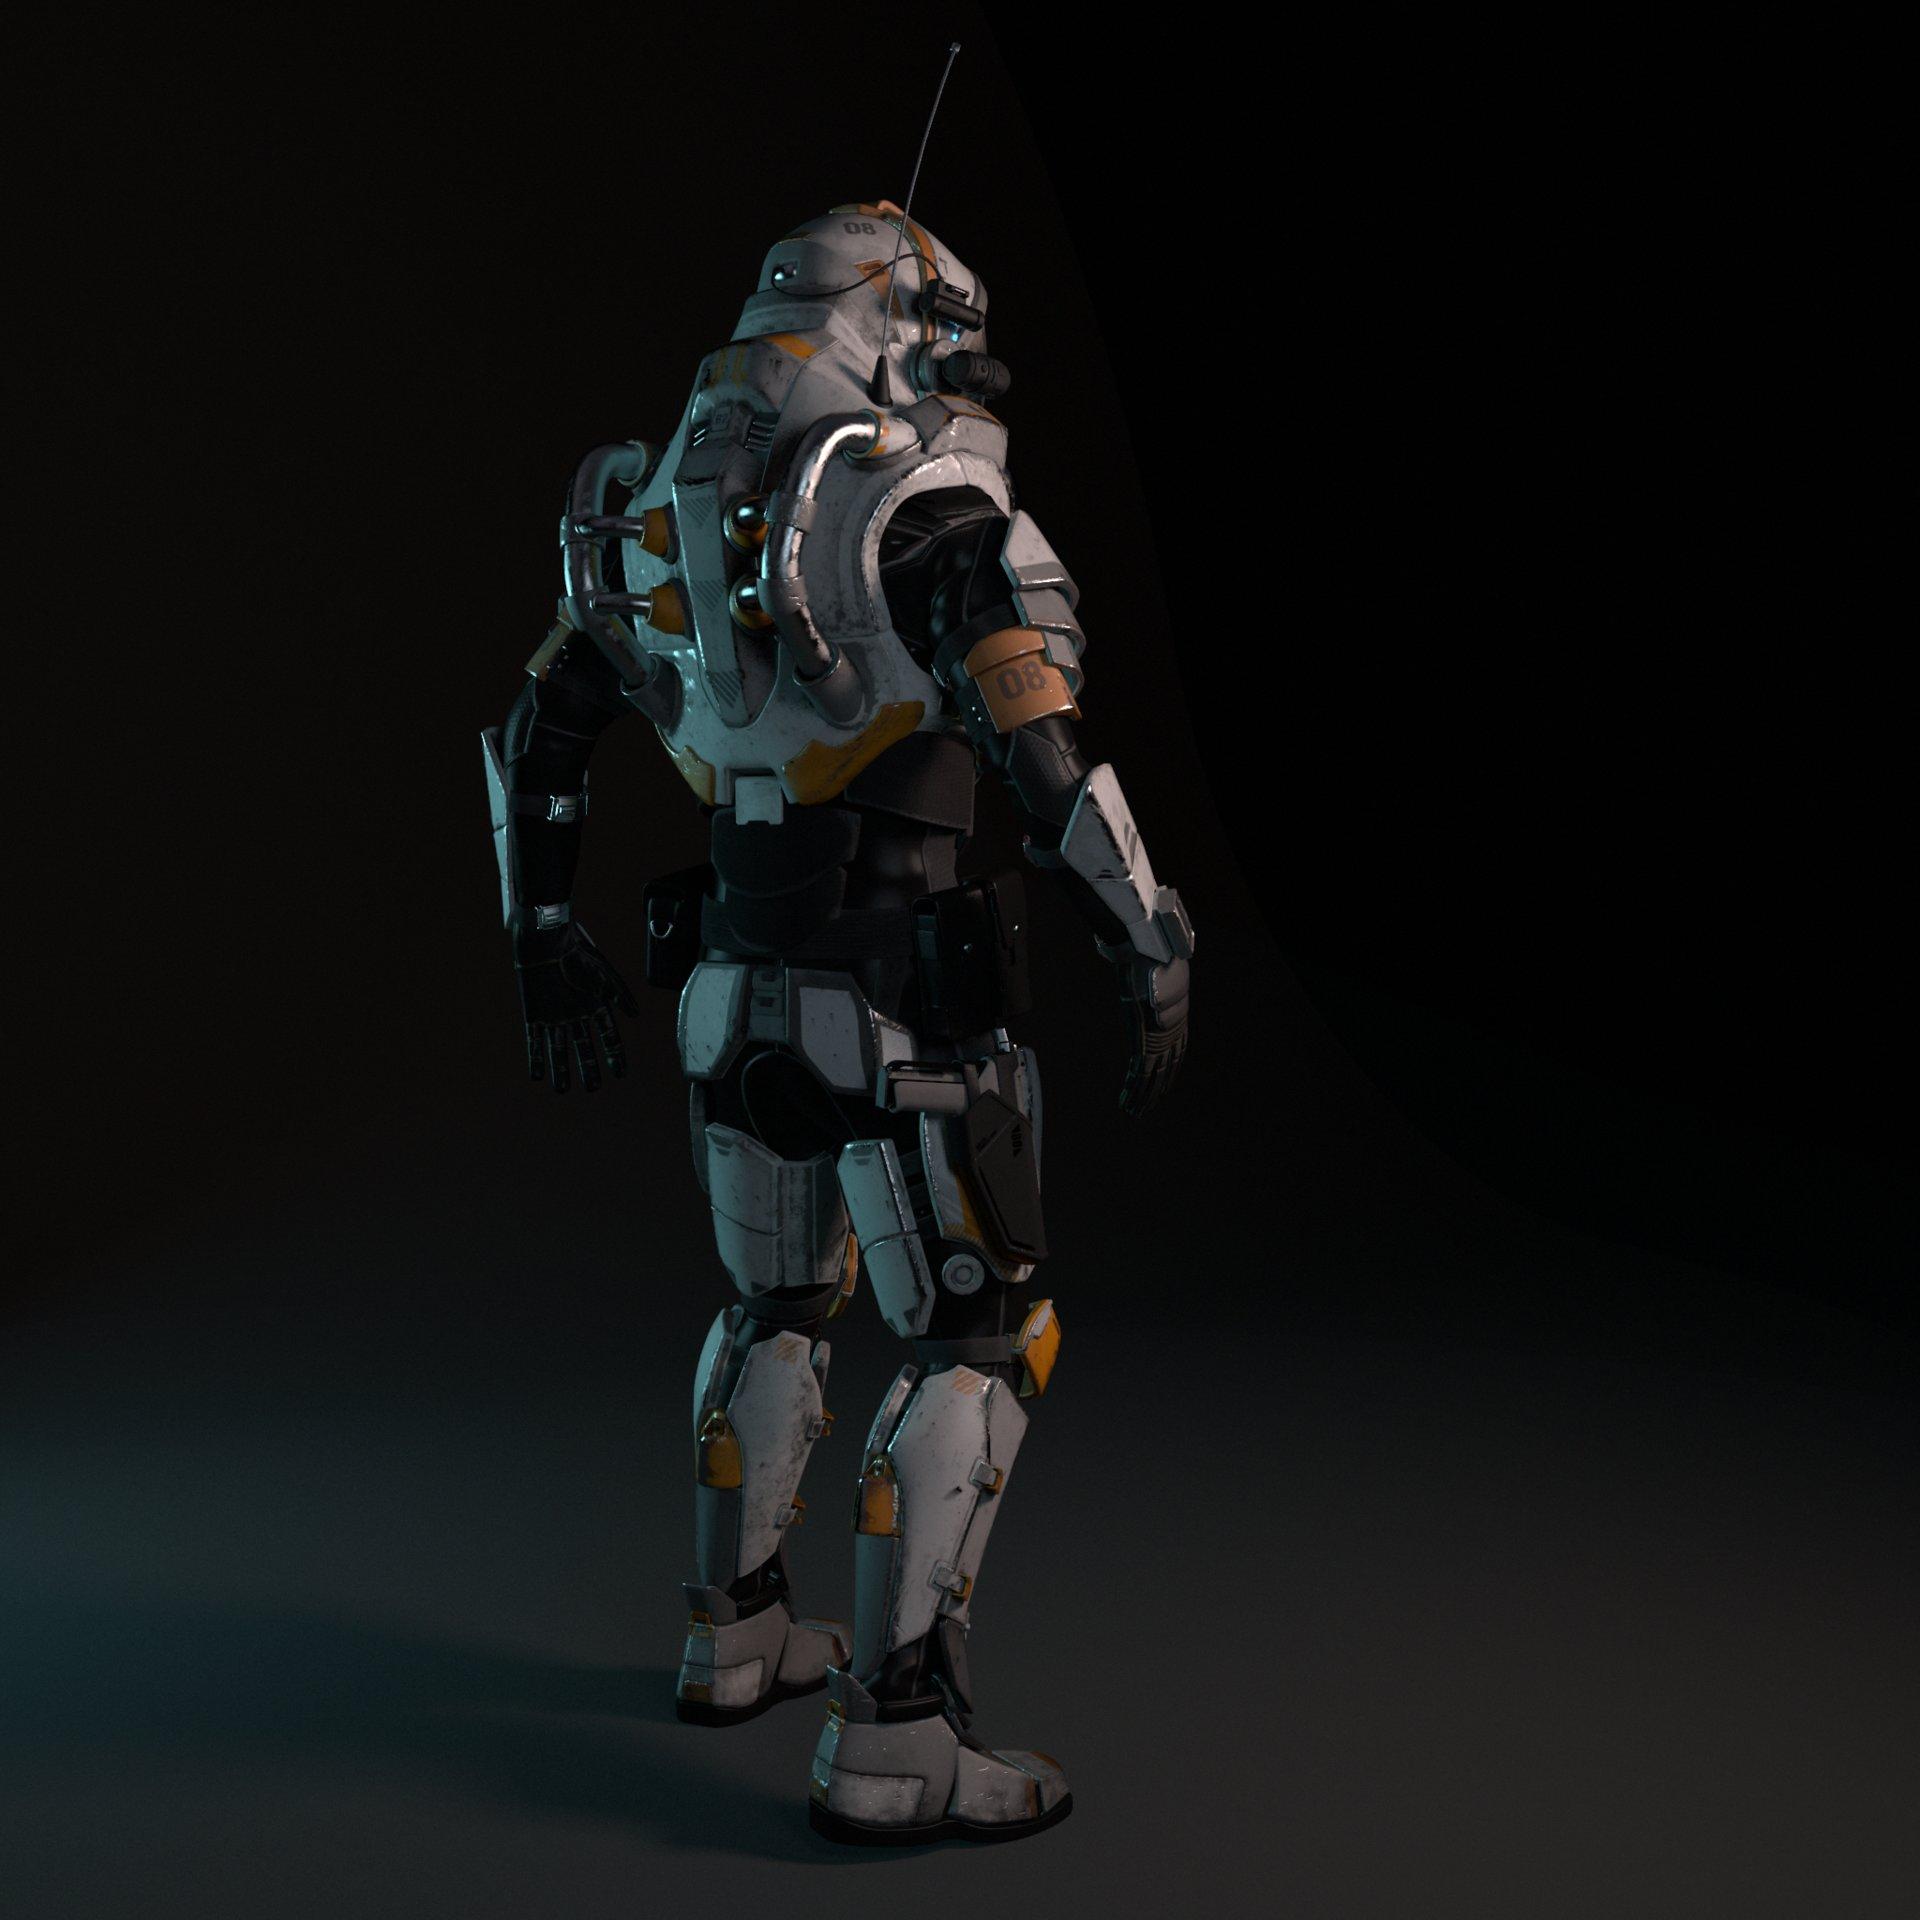 Boy sichterman armorback2k